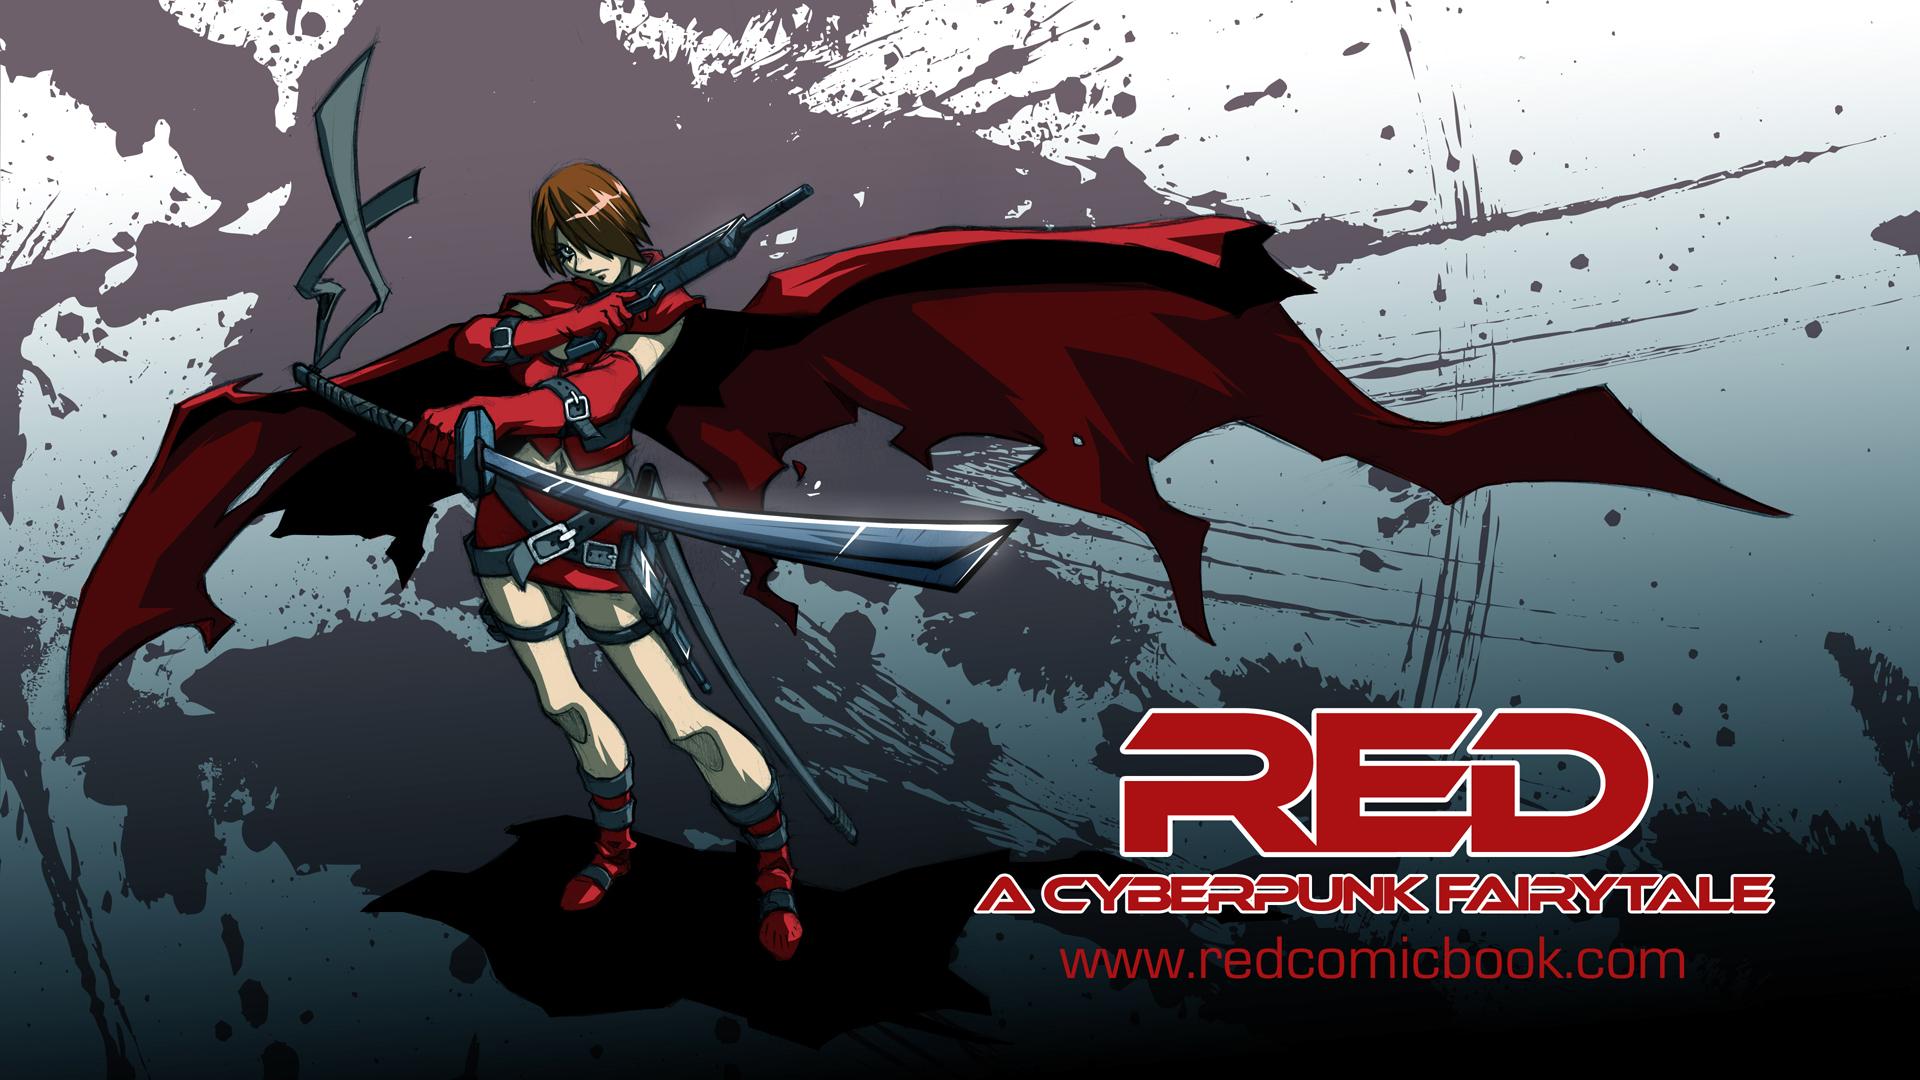 redwallpaper2.jpg